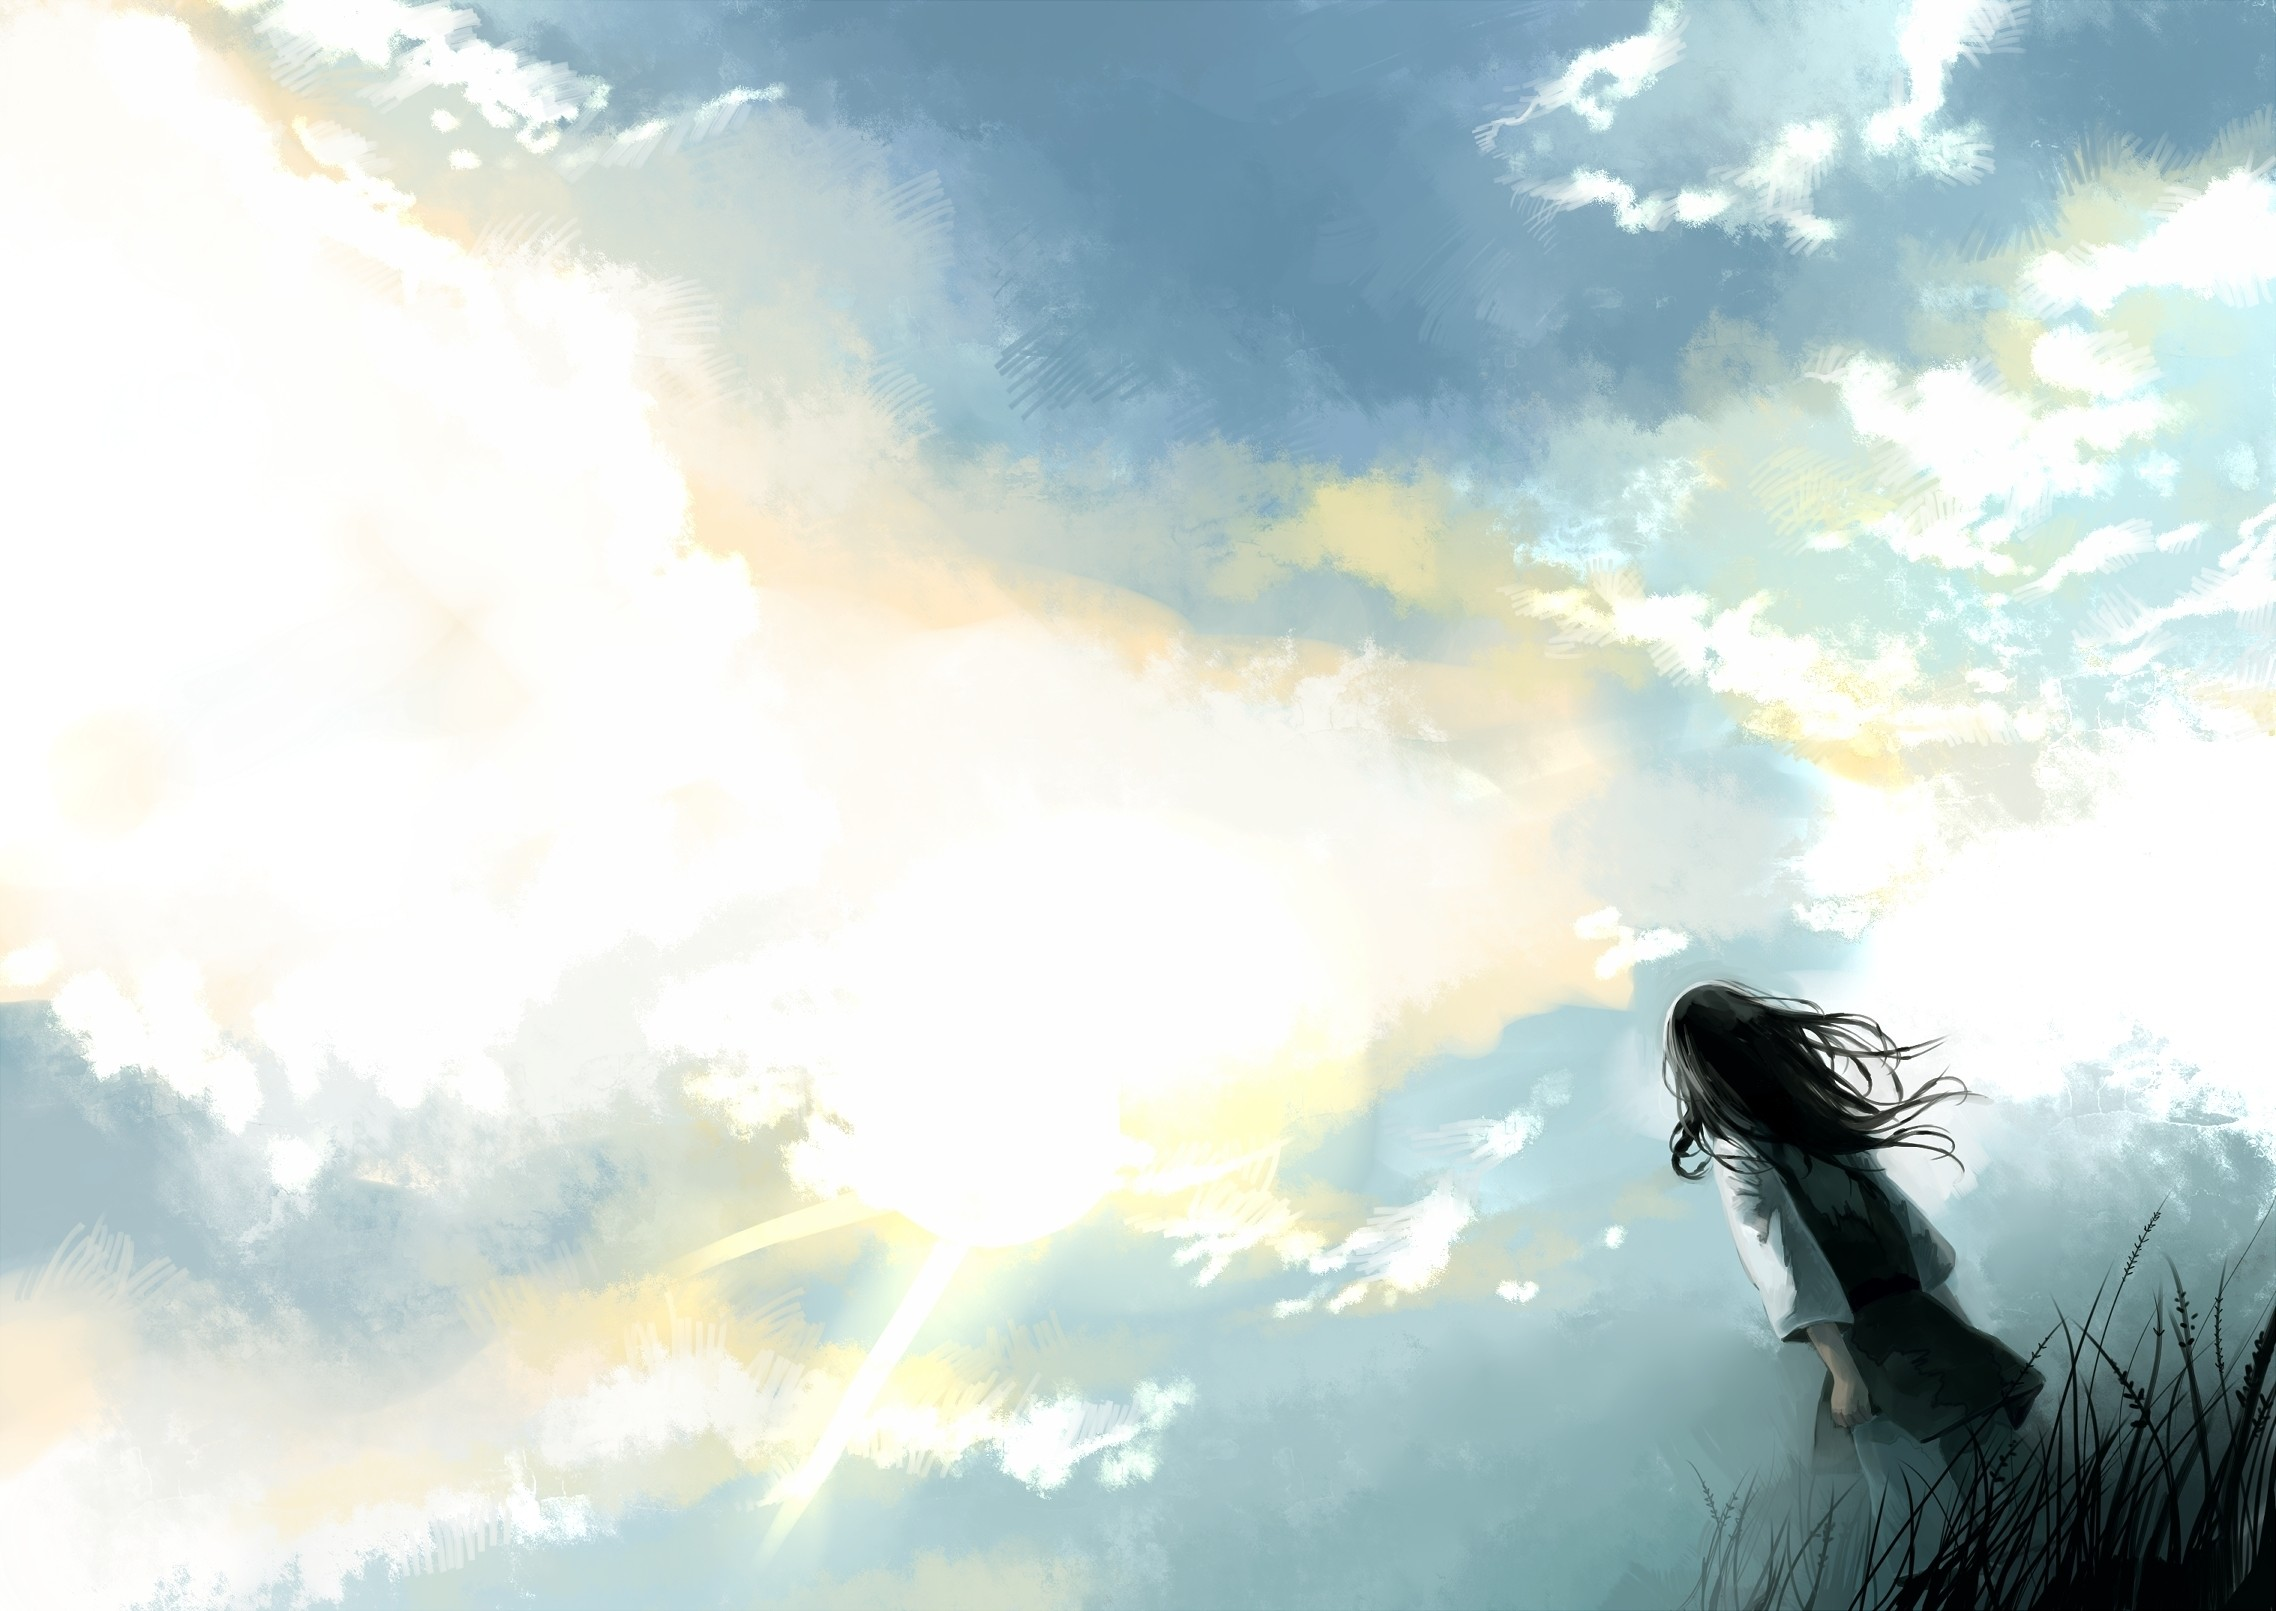 Sky Cloud Anime Desktop Wallpaper Images #08145 px 1.46 MB Anime  Sky Cloud Anime